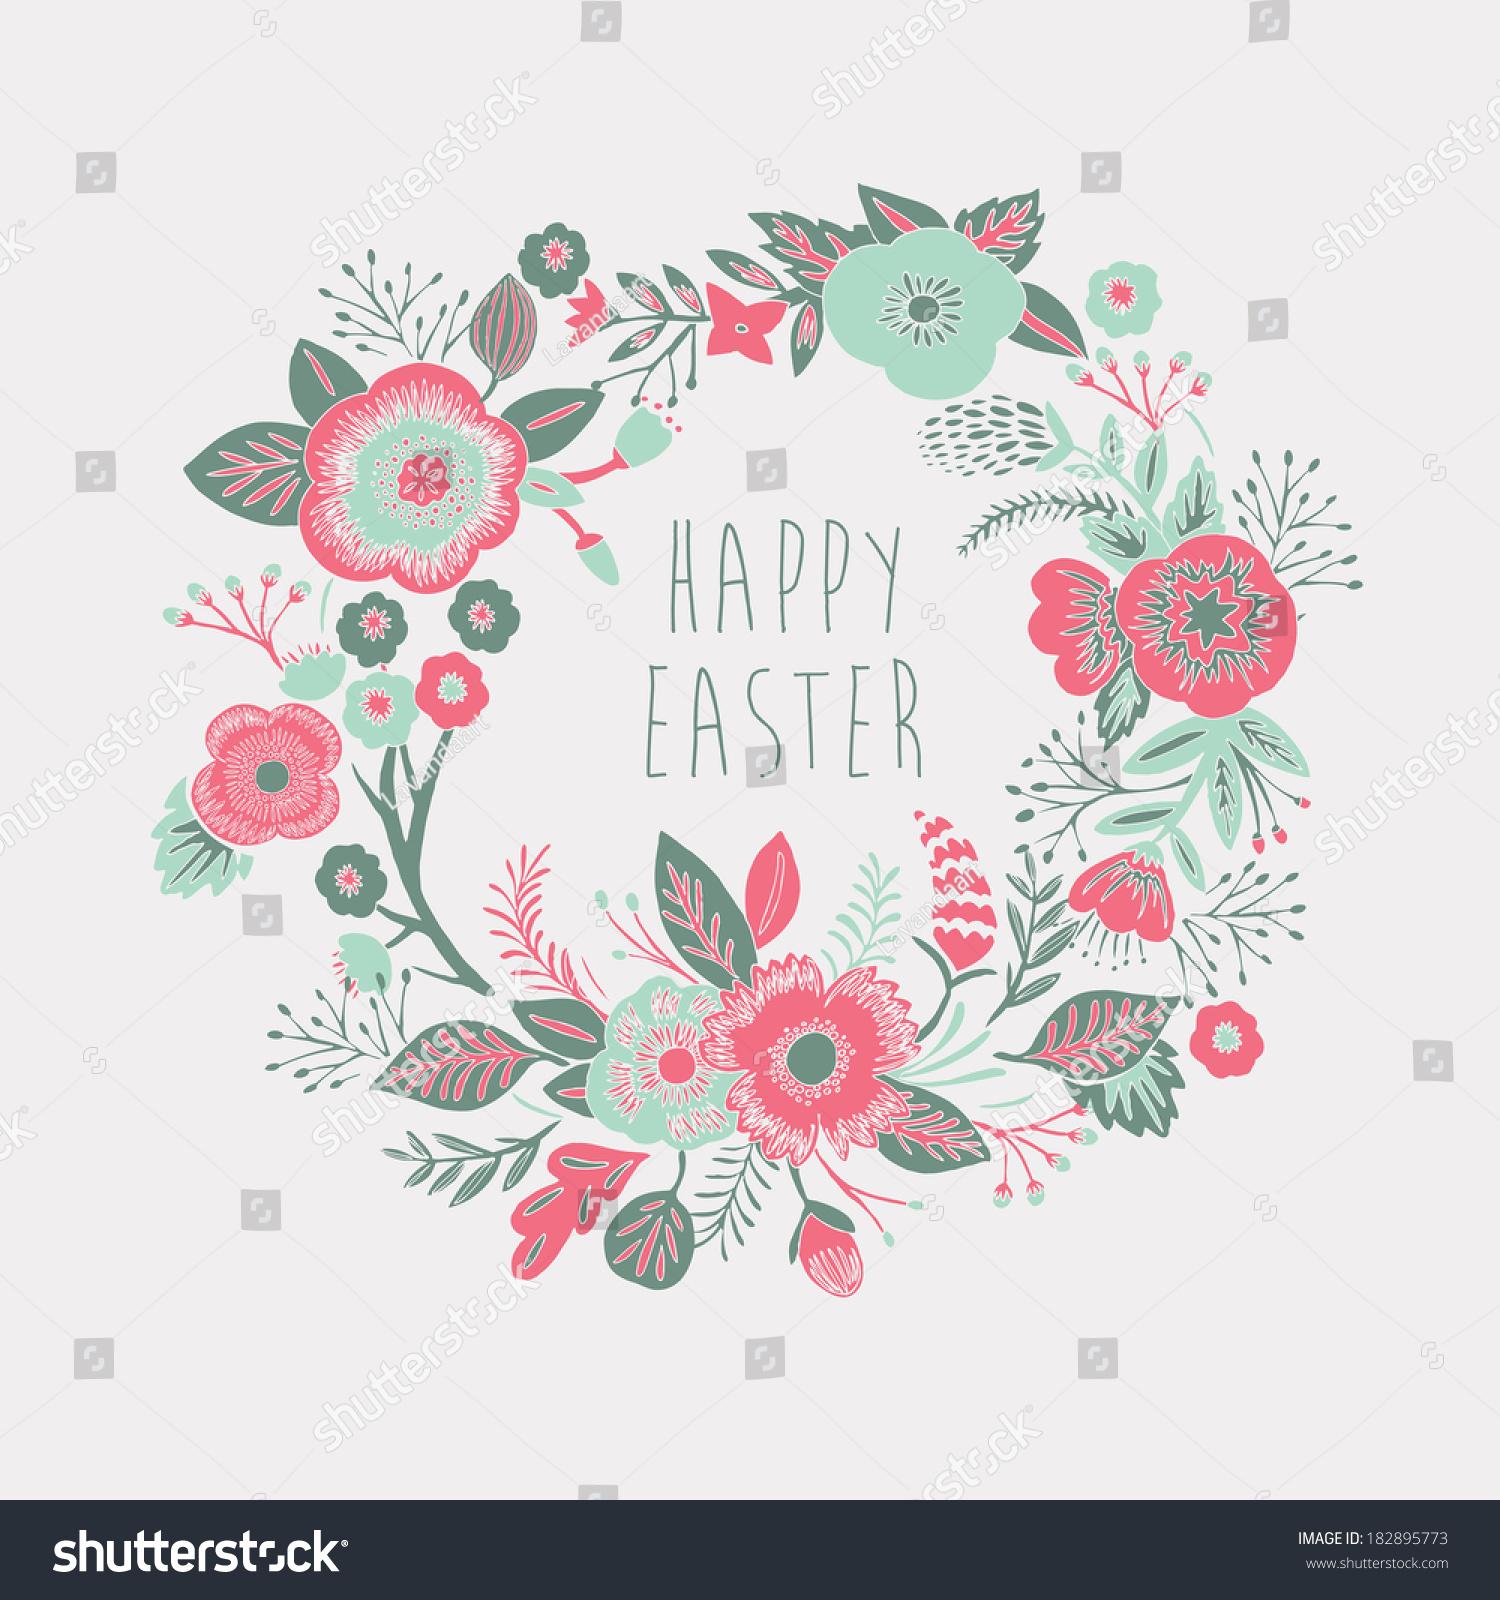 Happy Easter Card Stock Vector 182895773 - Shutterstock